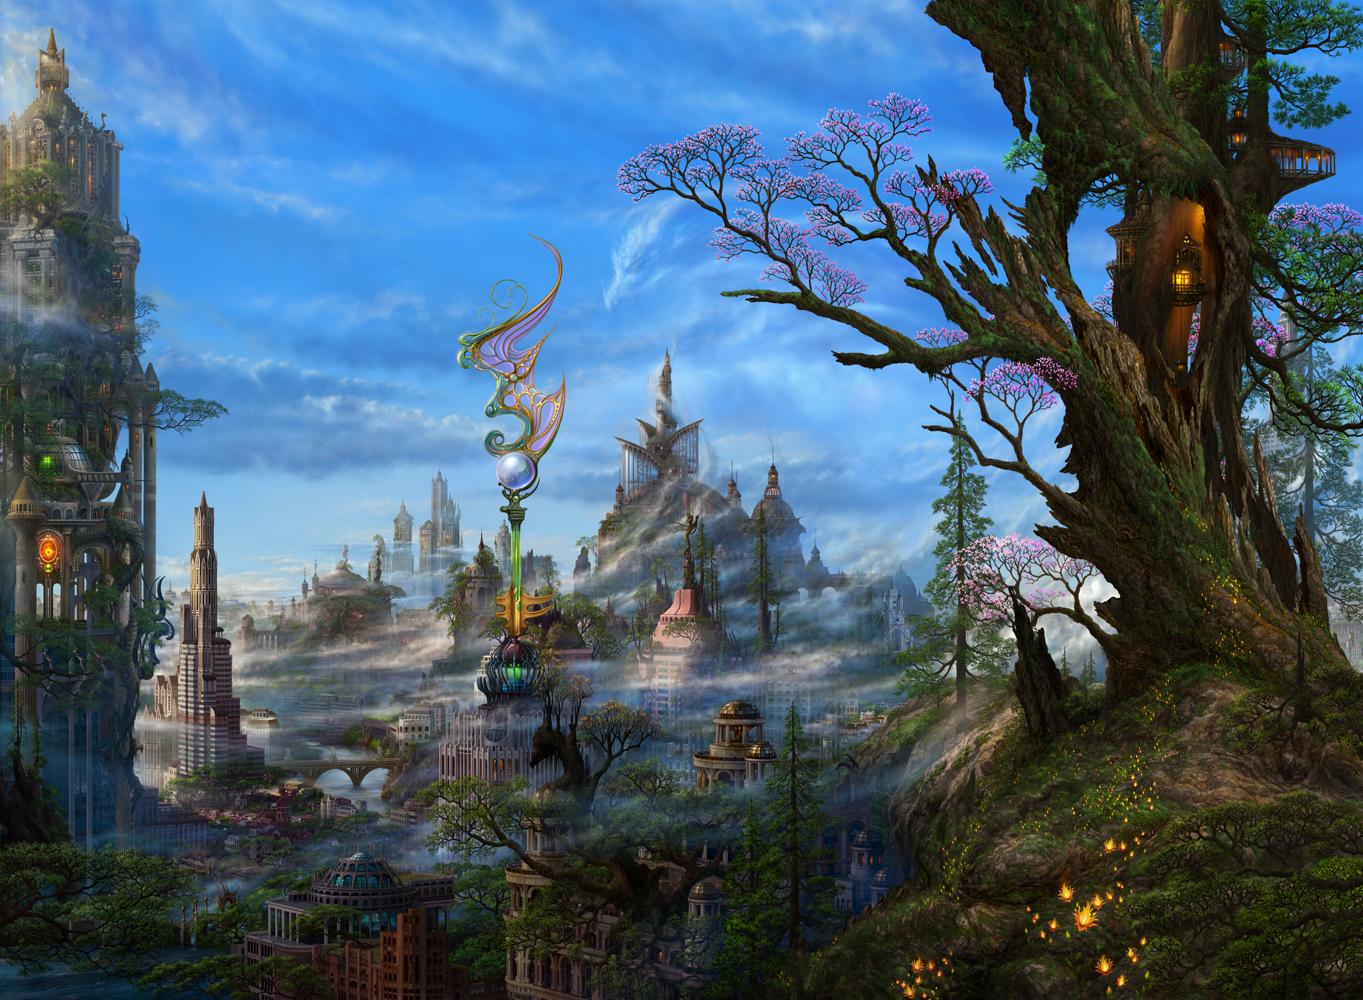 magical fantasy landscapes landscape - photo #20